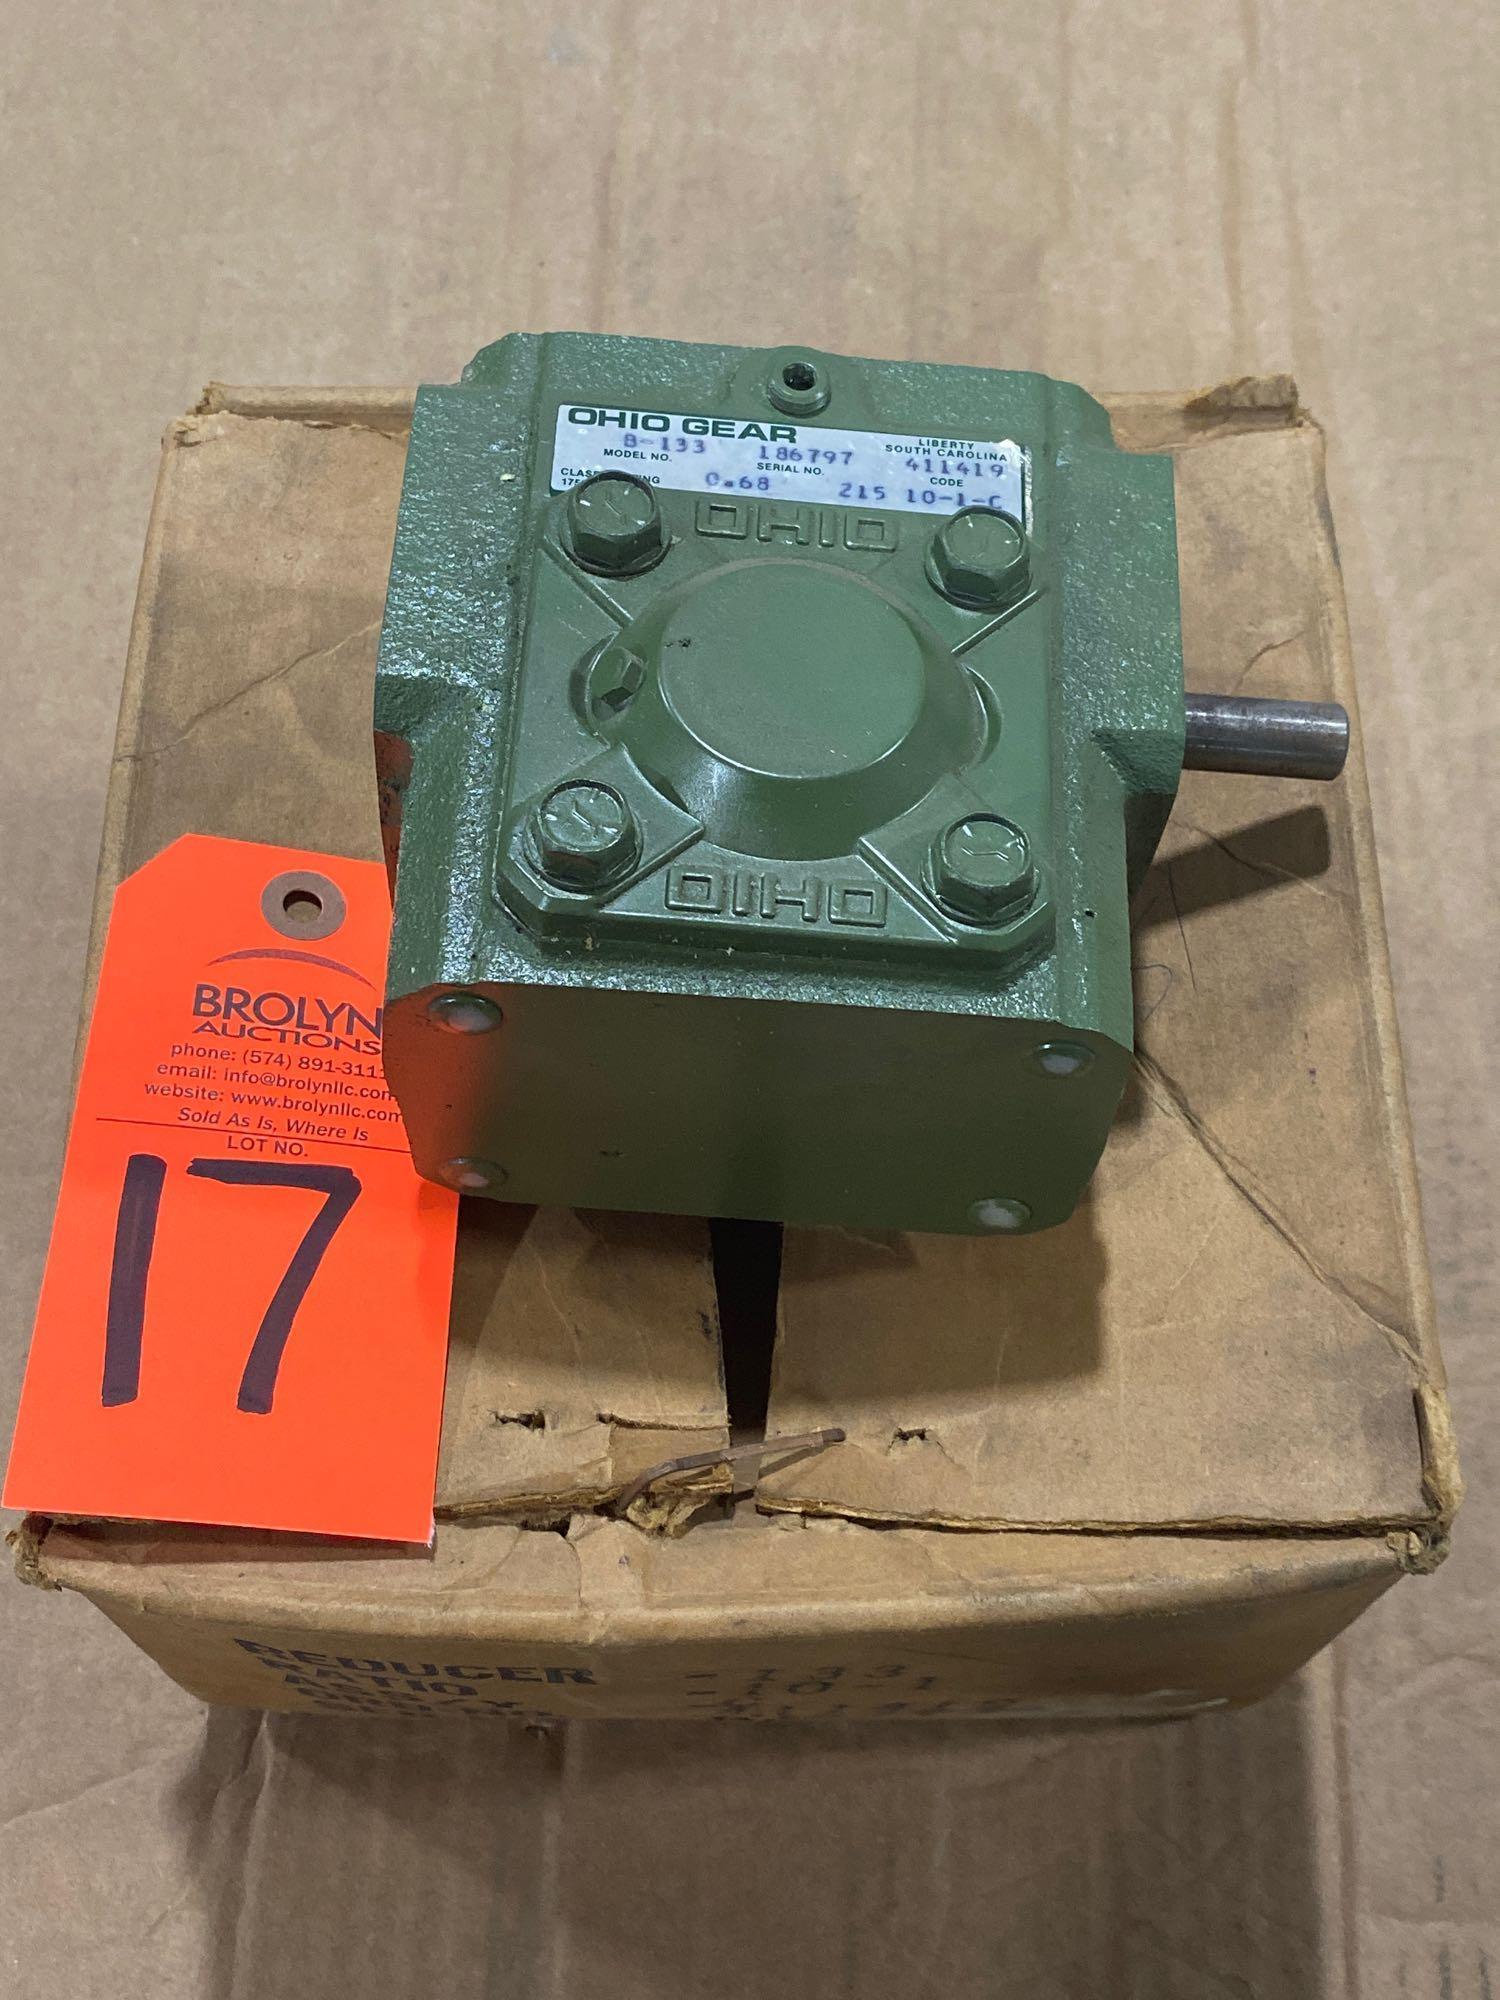 Lot 17 - Ohio Gear model B-133 gearbox. 10:1 ratio. New in box.